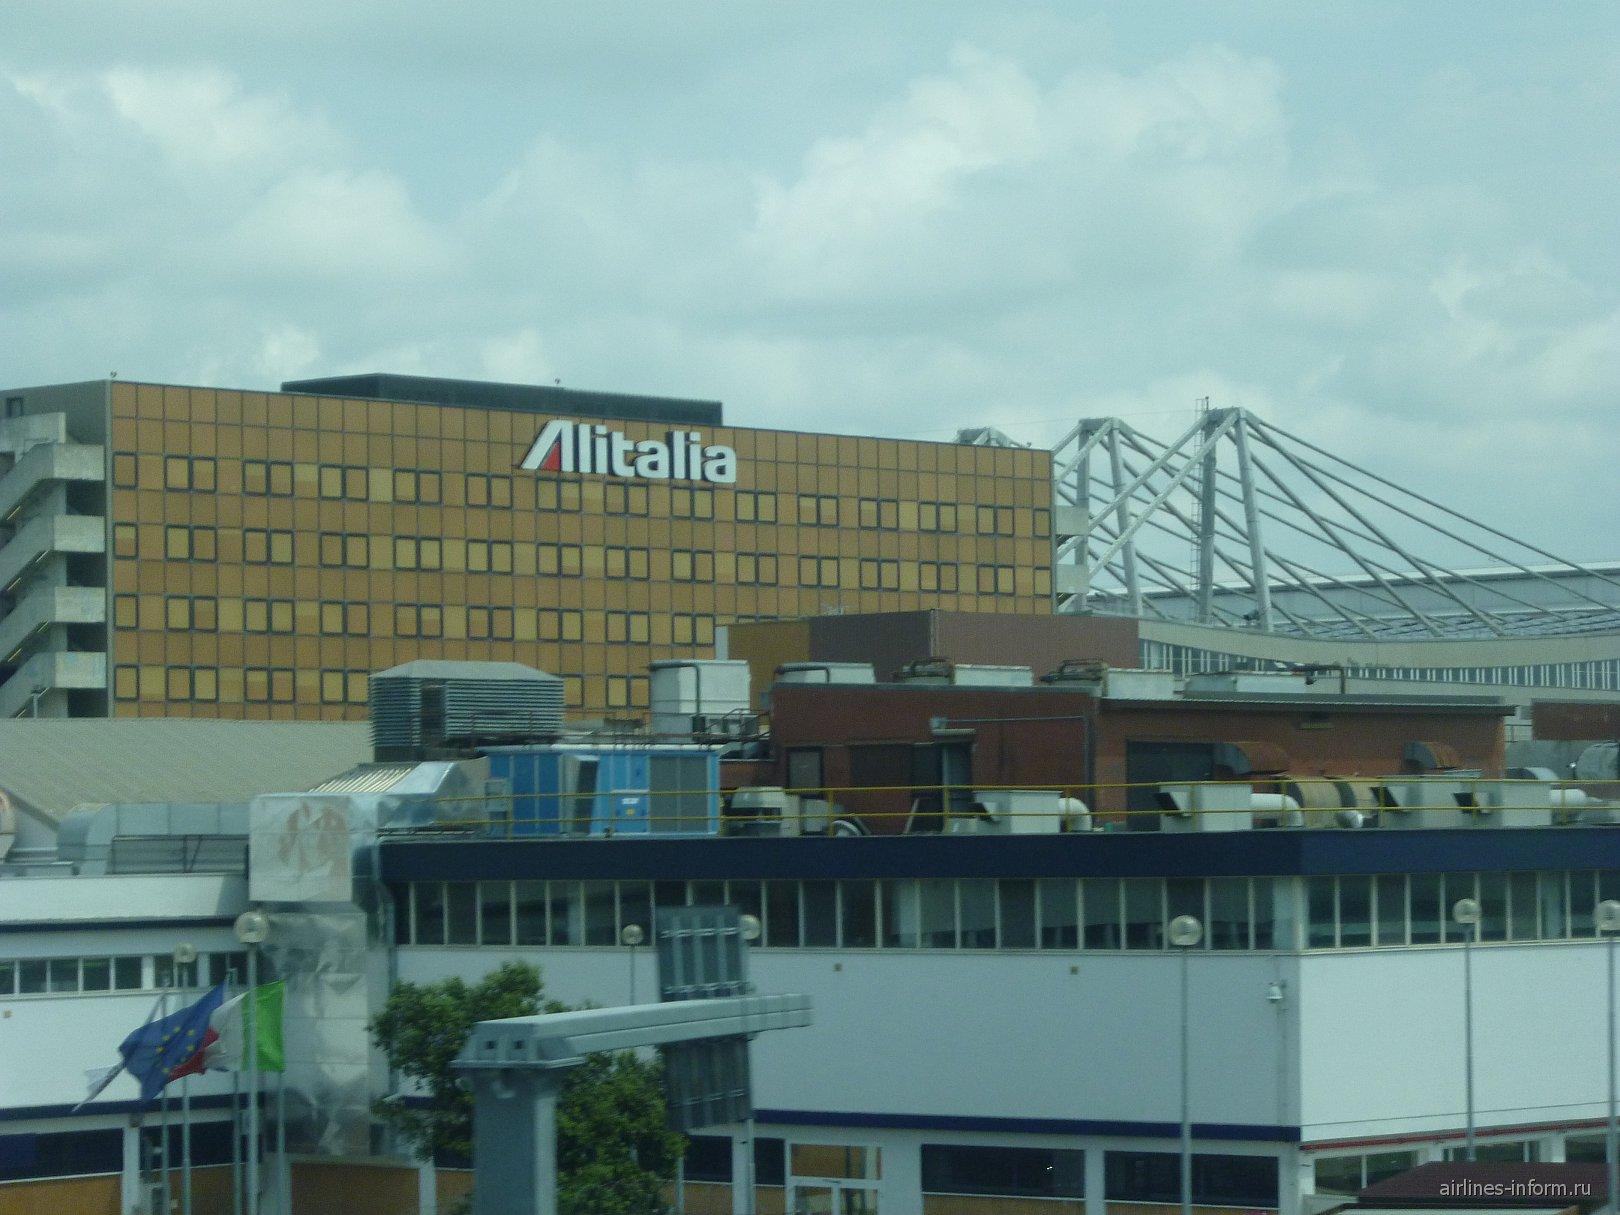 Штаб-квартира авиакомпании Алиталия в аэропорту Рим Фьюмичино